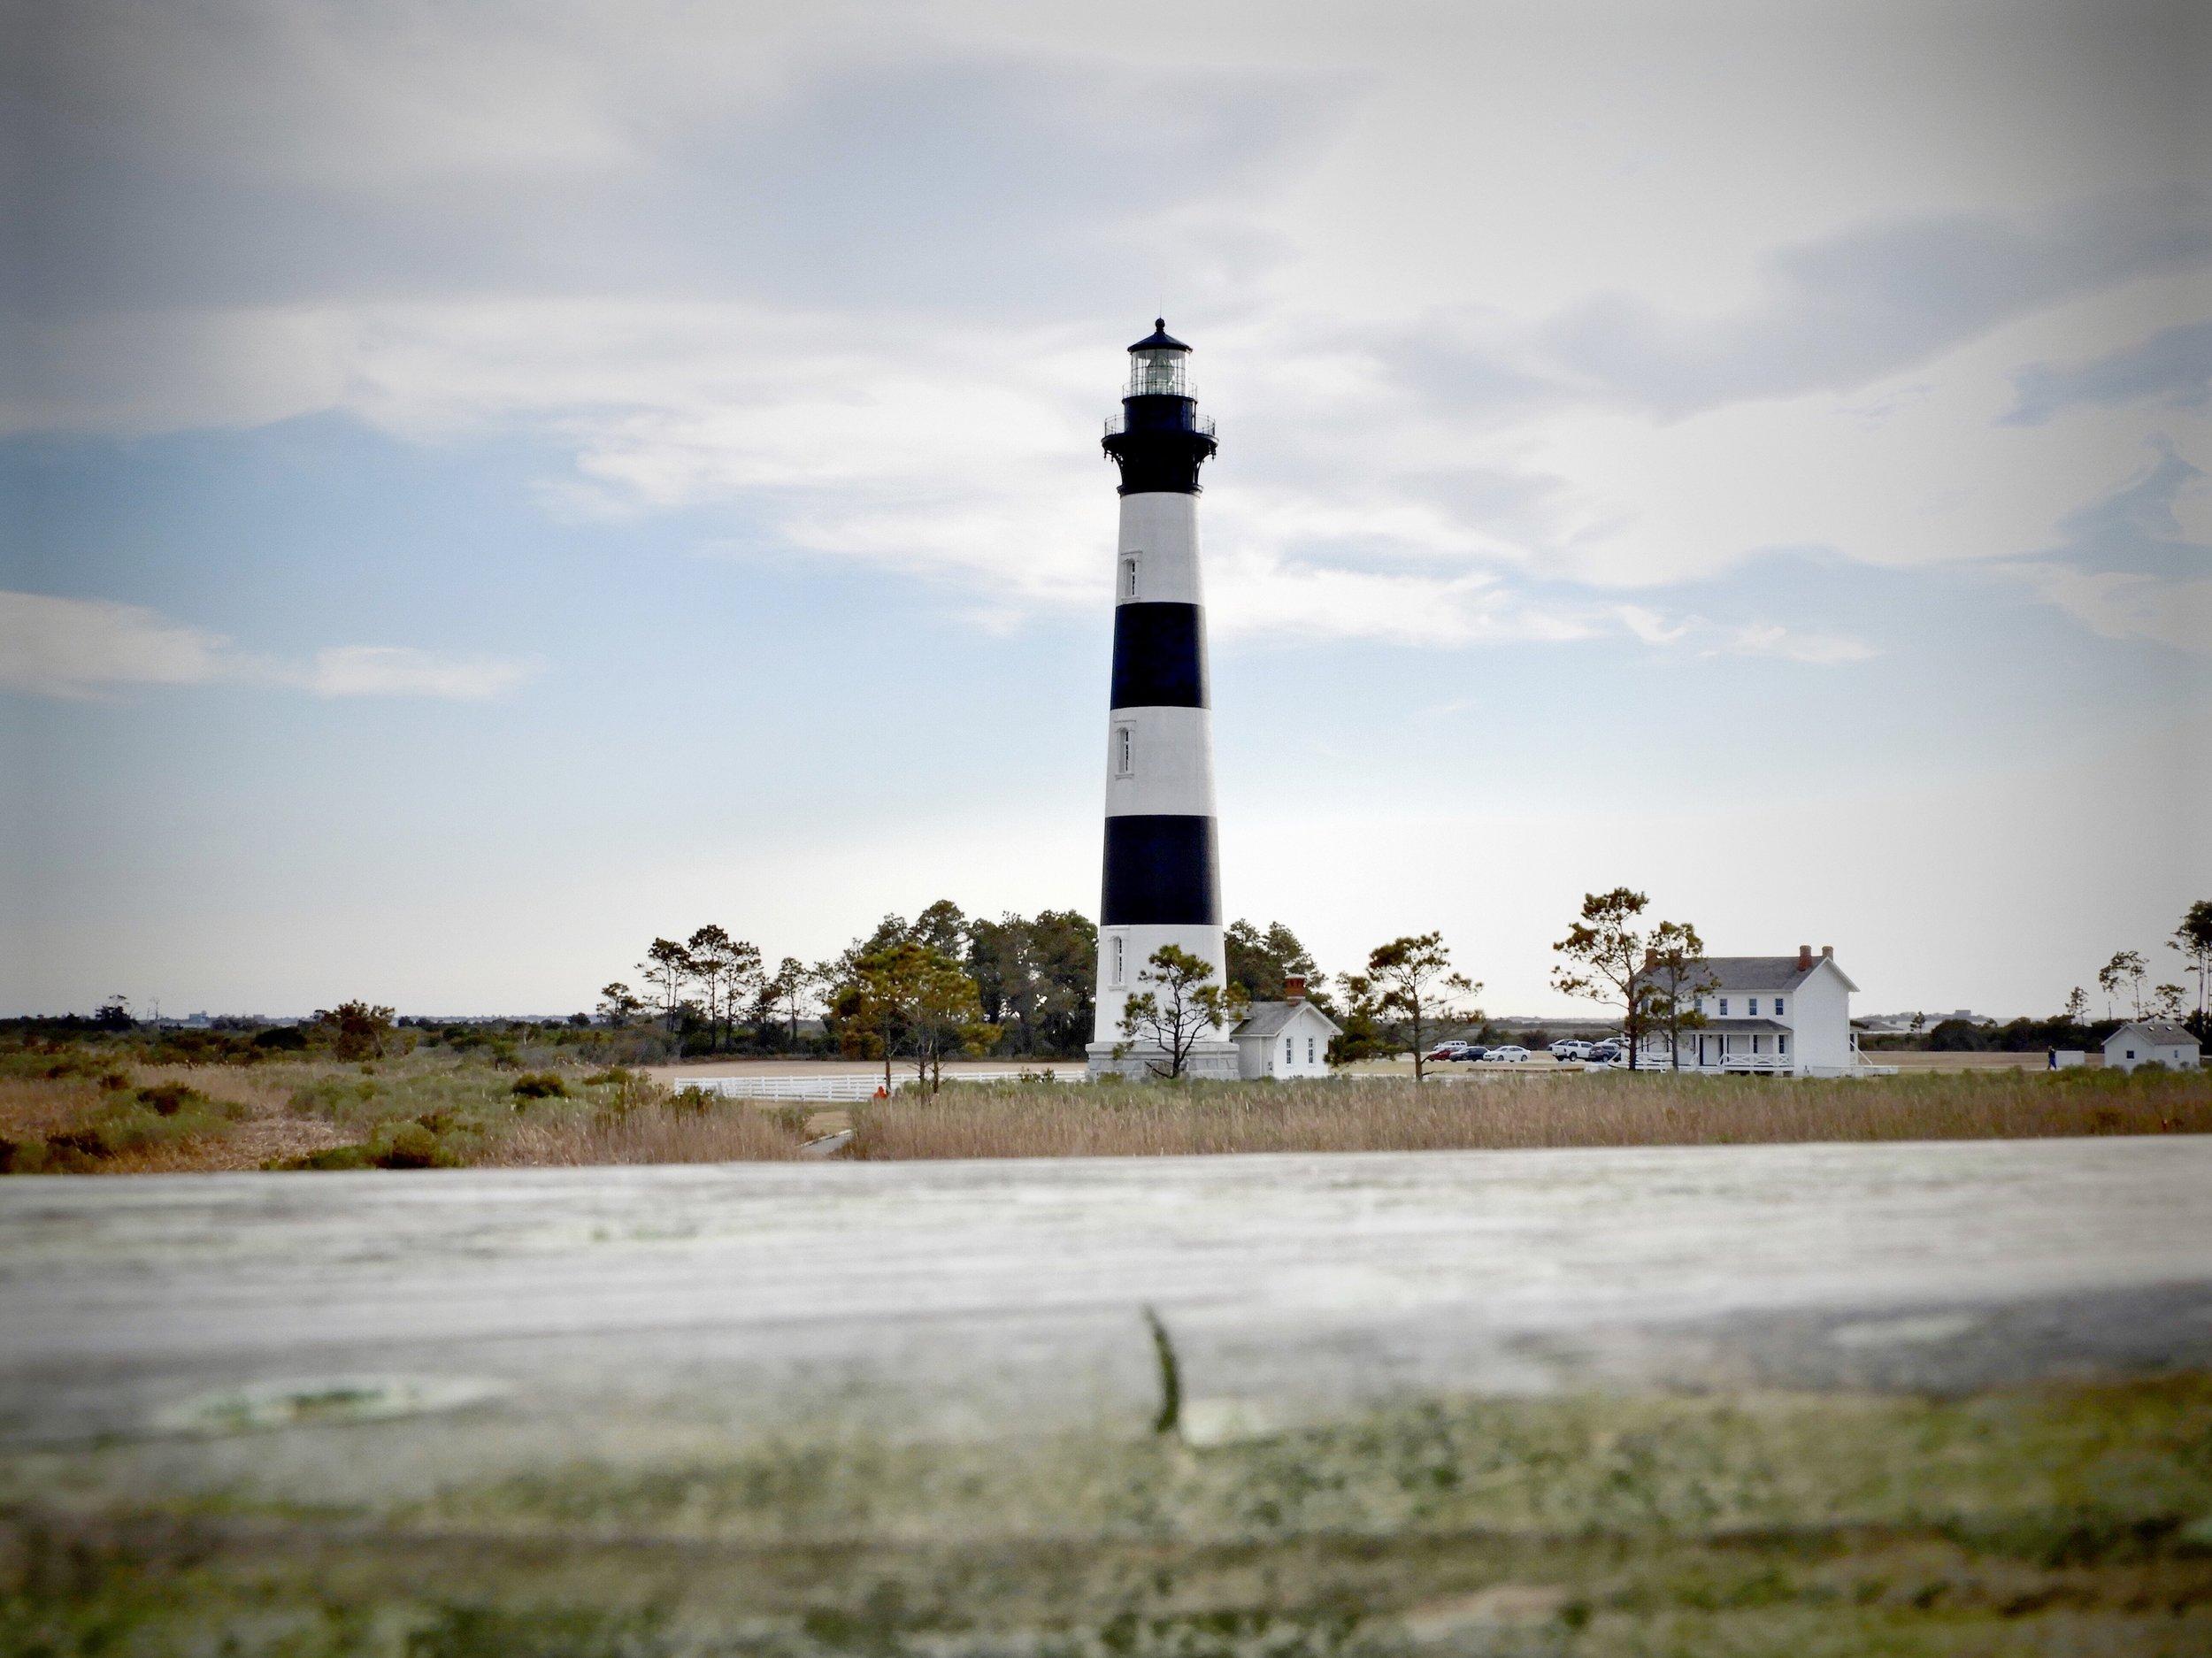 Bodie Island Lighthouse - 2017